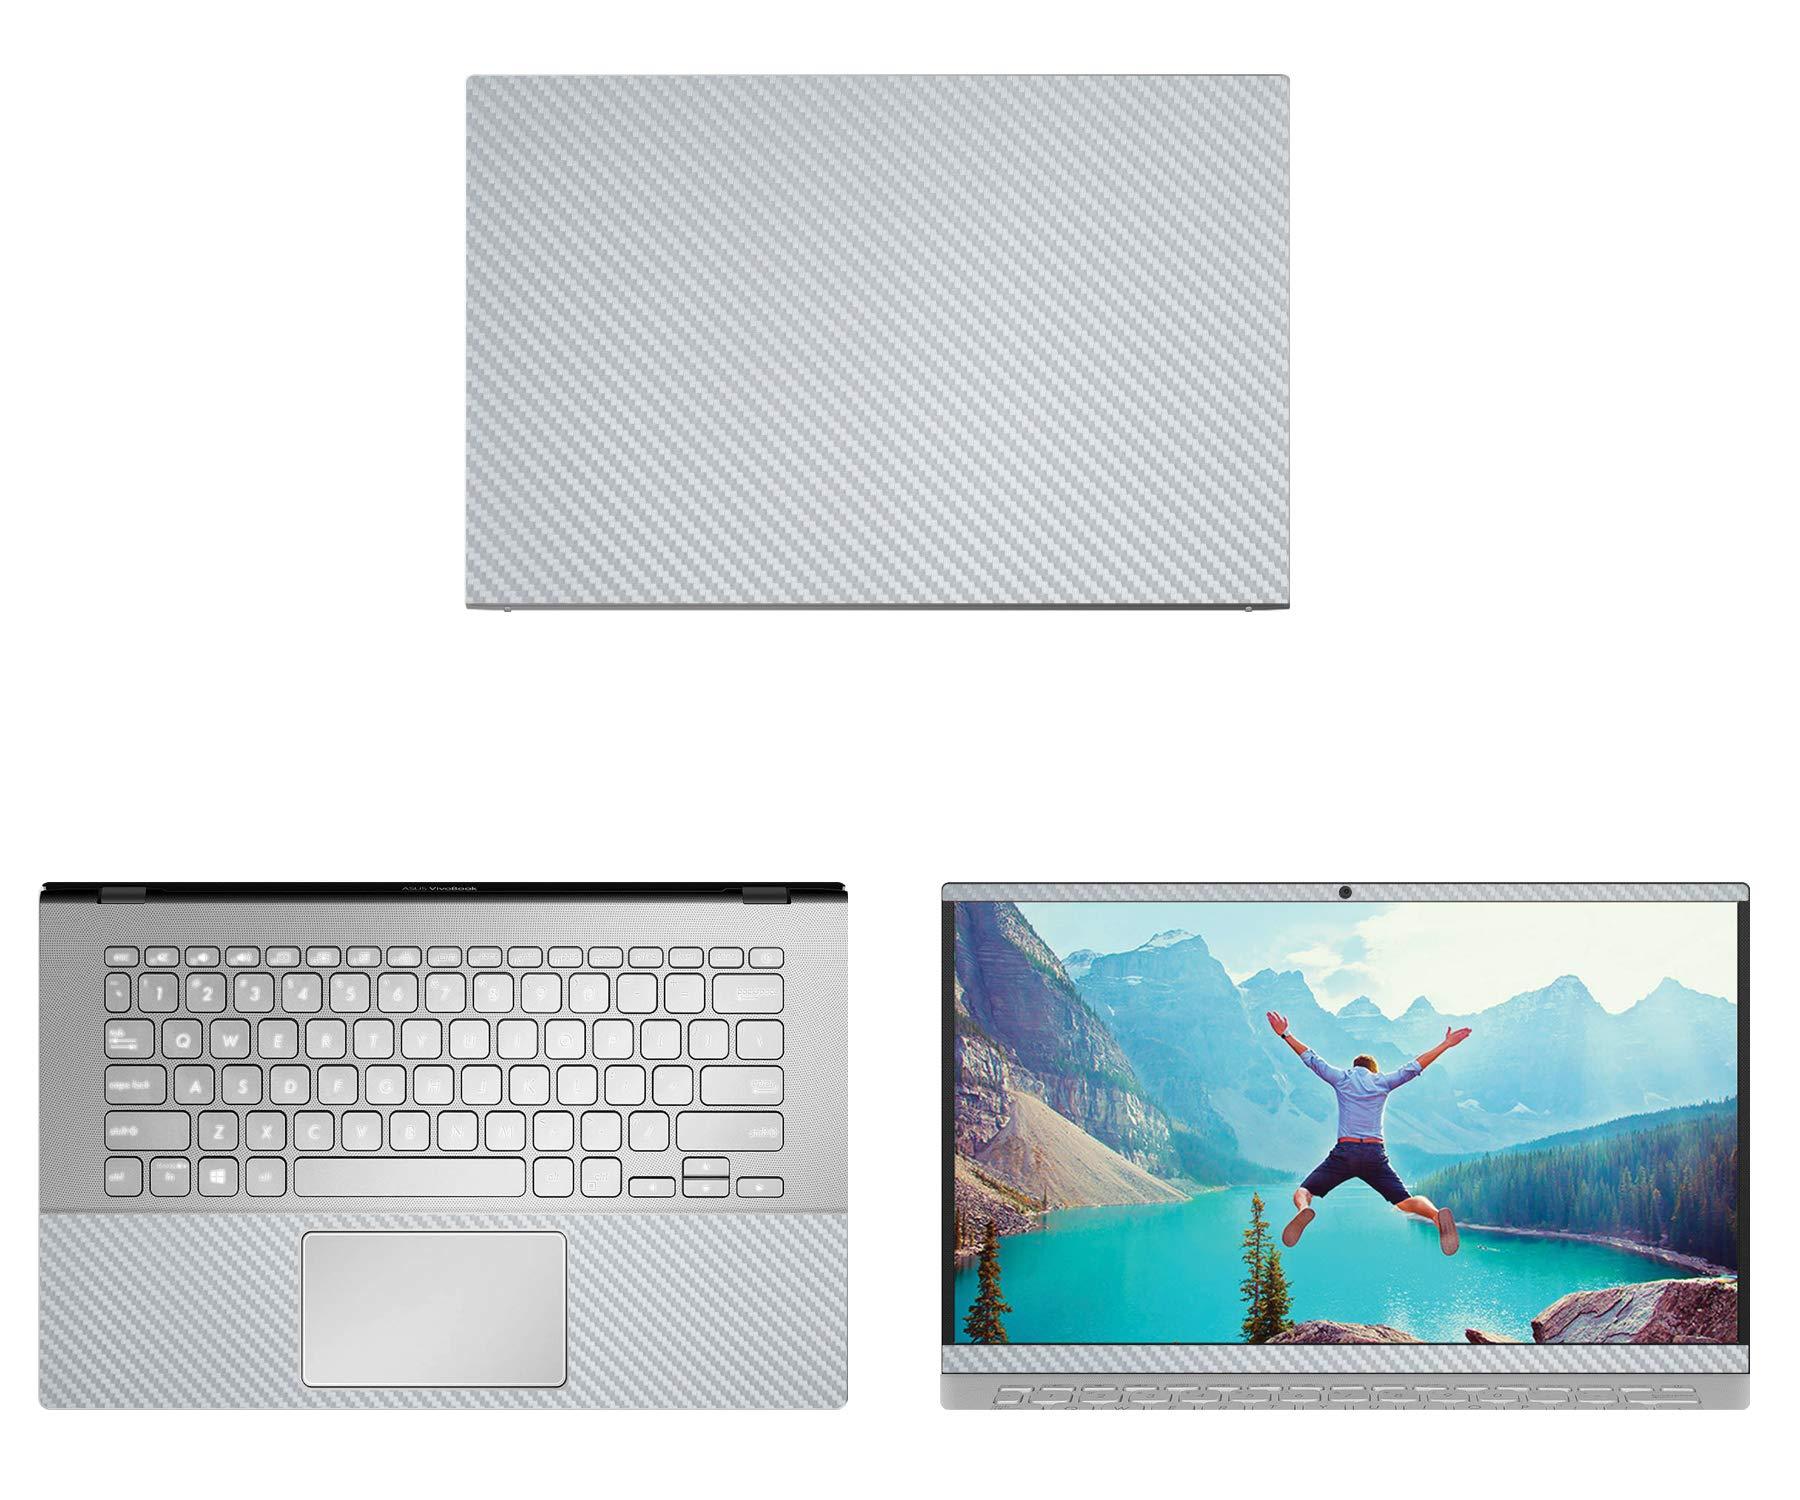 decalrus - Protective Decal for Asus VivoBook 14 X420UA (14'' Screen) Laptop Silver Carbon Fiber Skin case Cover wrap CFasusVivobk14_x420uaSilver